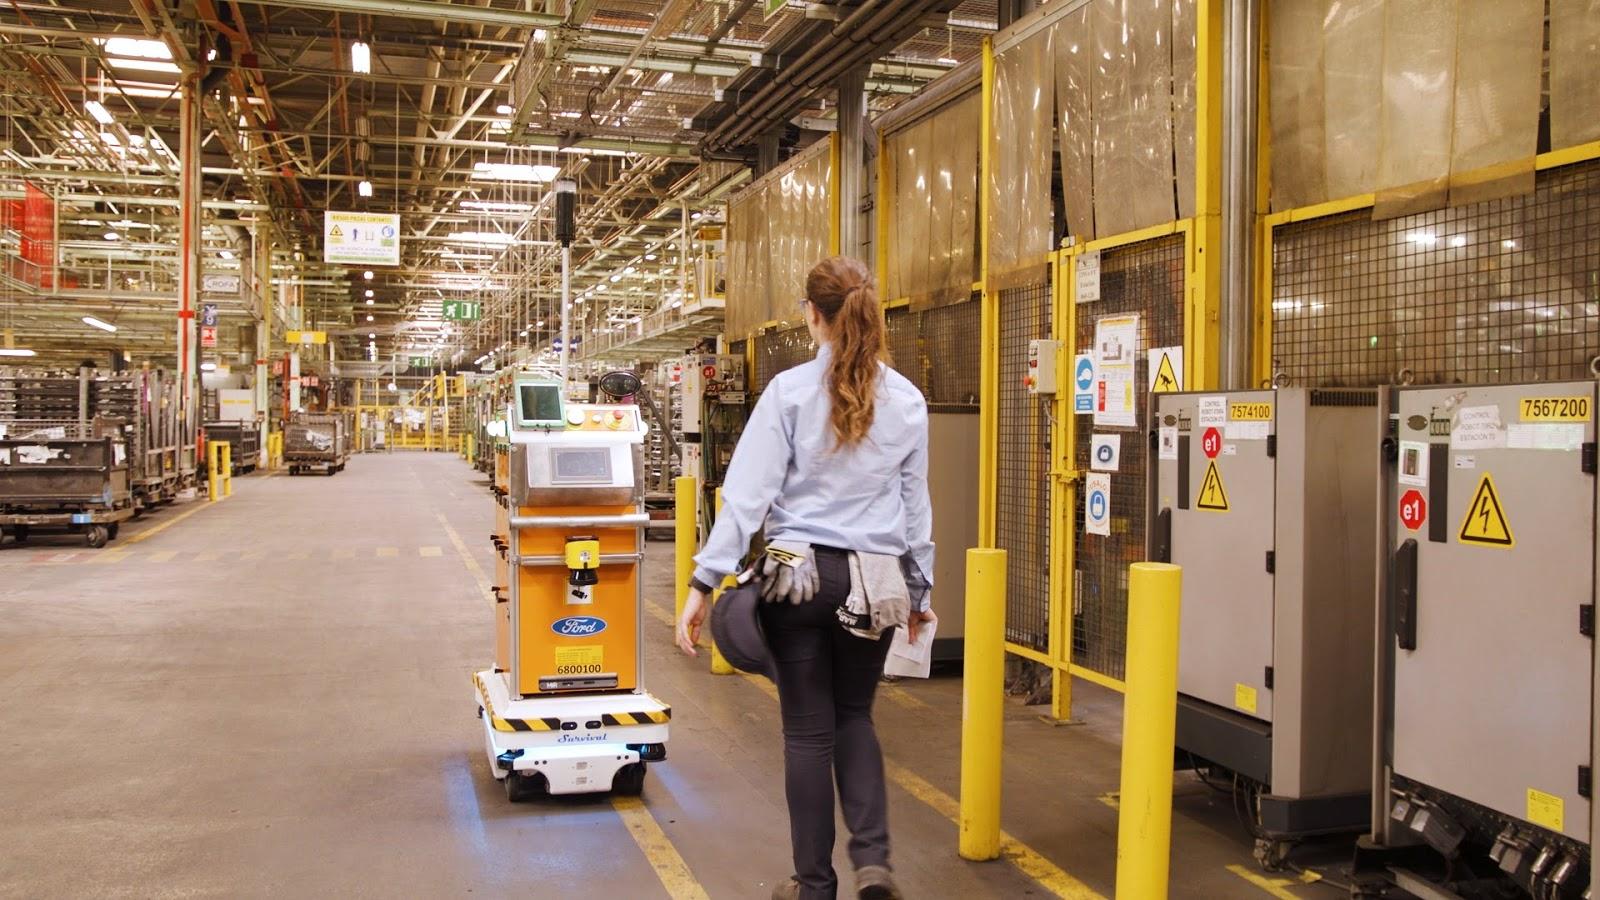 Ford SelfDrivingRobot 10 Η Ford έφτιαξε ένα ρομπότ για τις χαμαλοδουλειές του εργοστασίου της! Ford, video, videos, Εργοστάσιο, Τεχνολογία